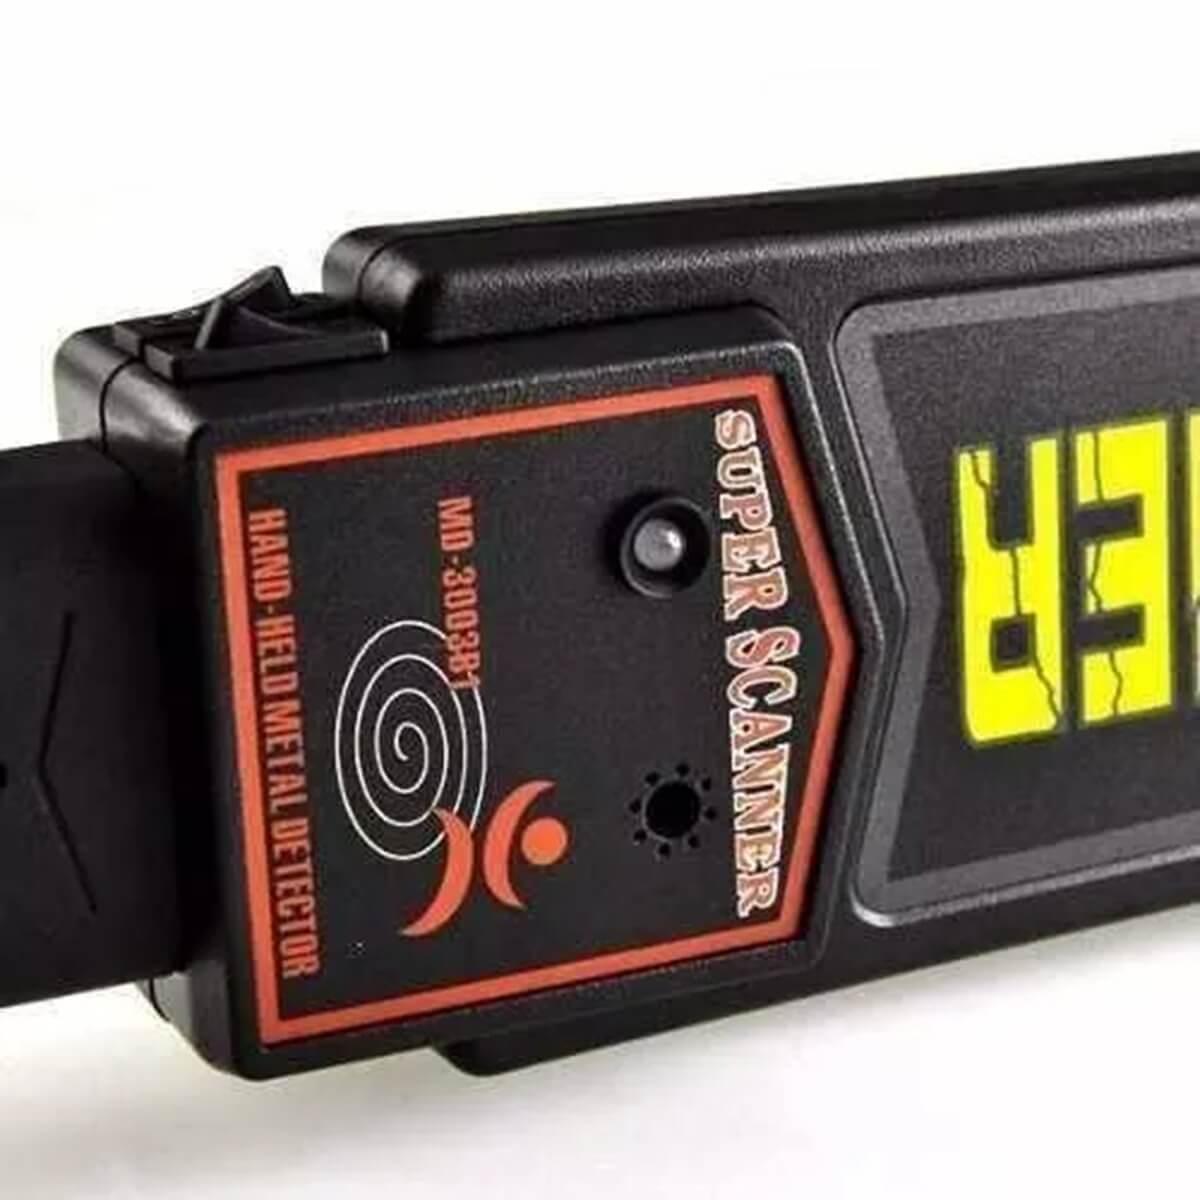 Detector de Metais Portatil OQ201